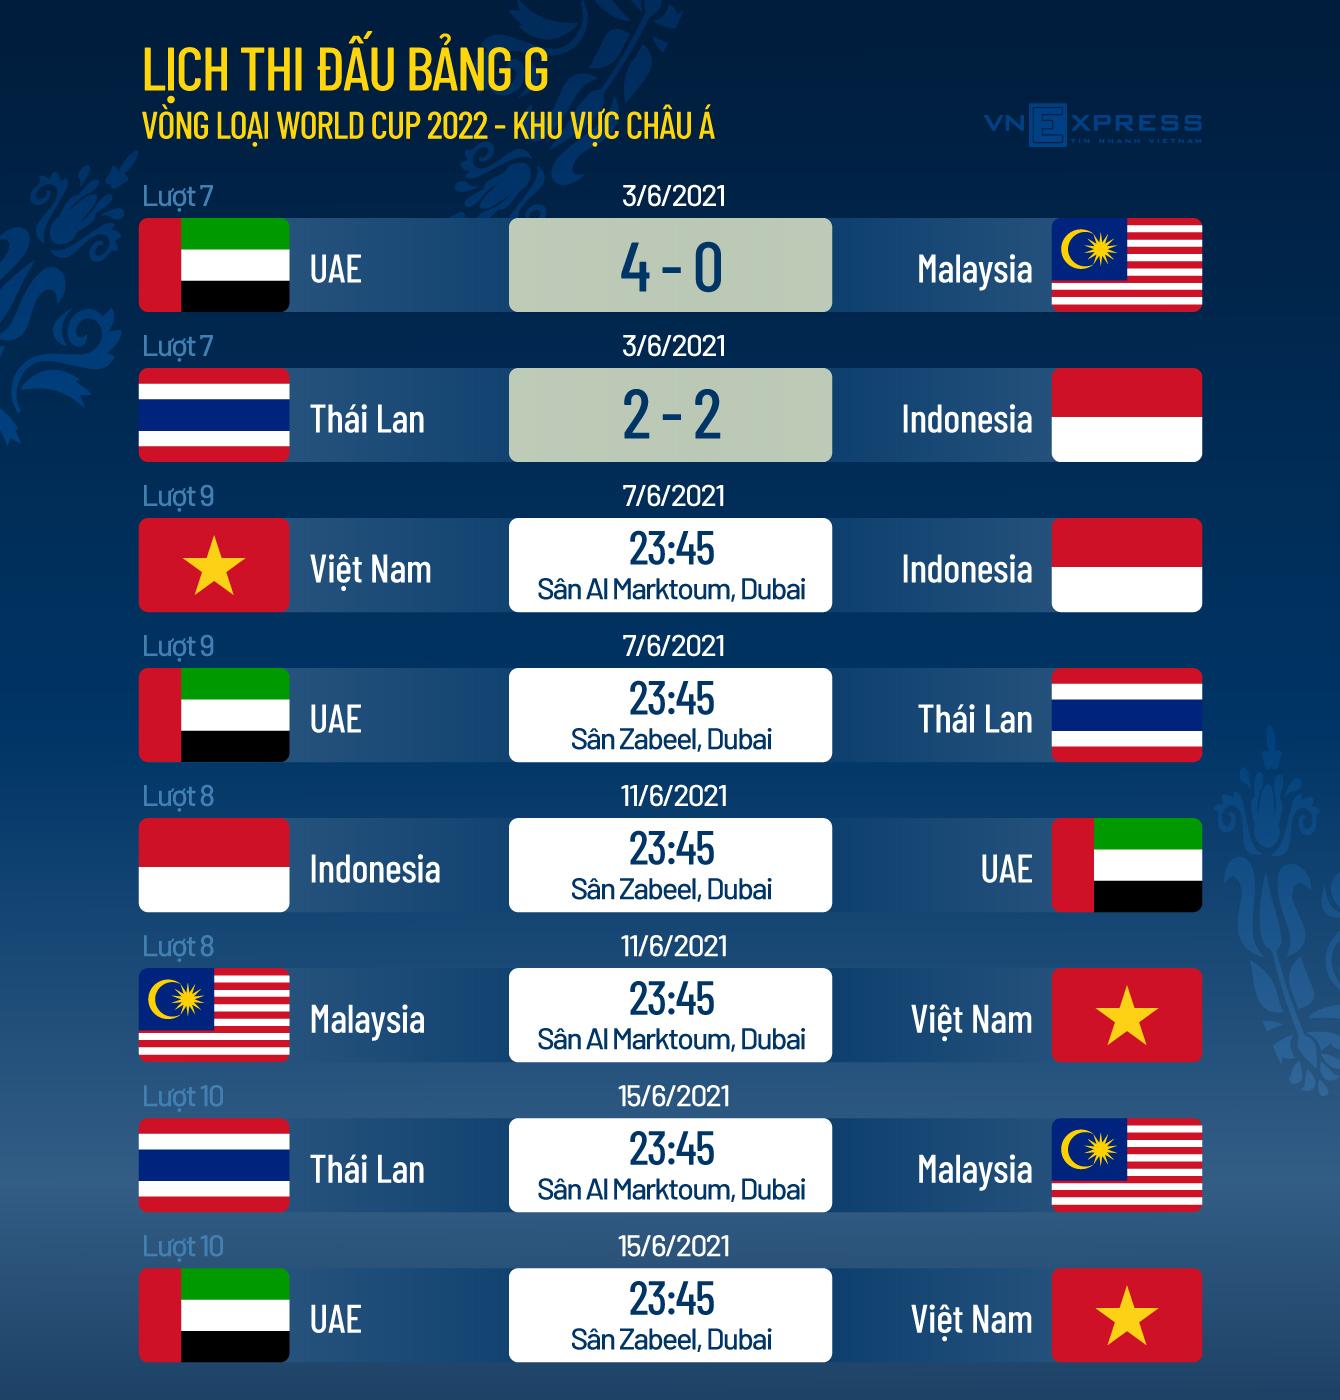 HLV Park Hang-seo: Việt Nam phải thắng Indonesia - 2